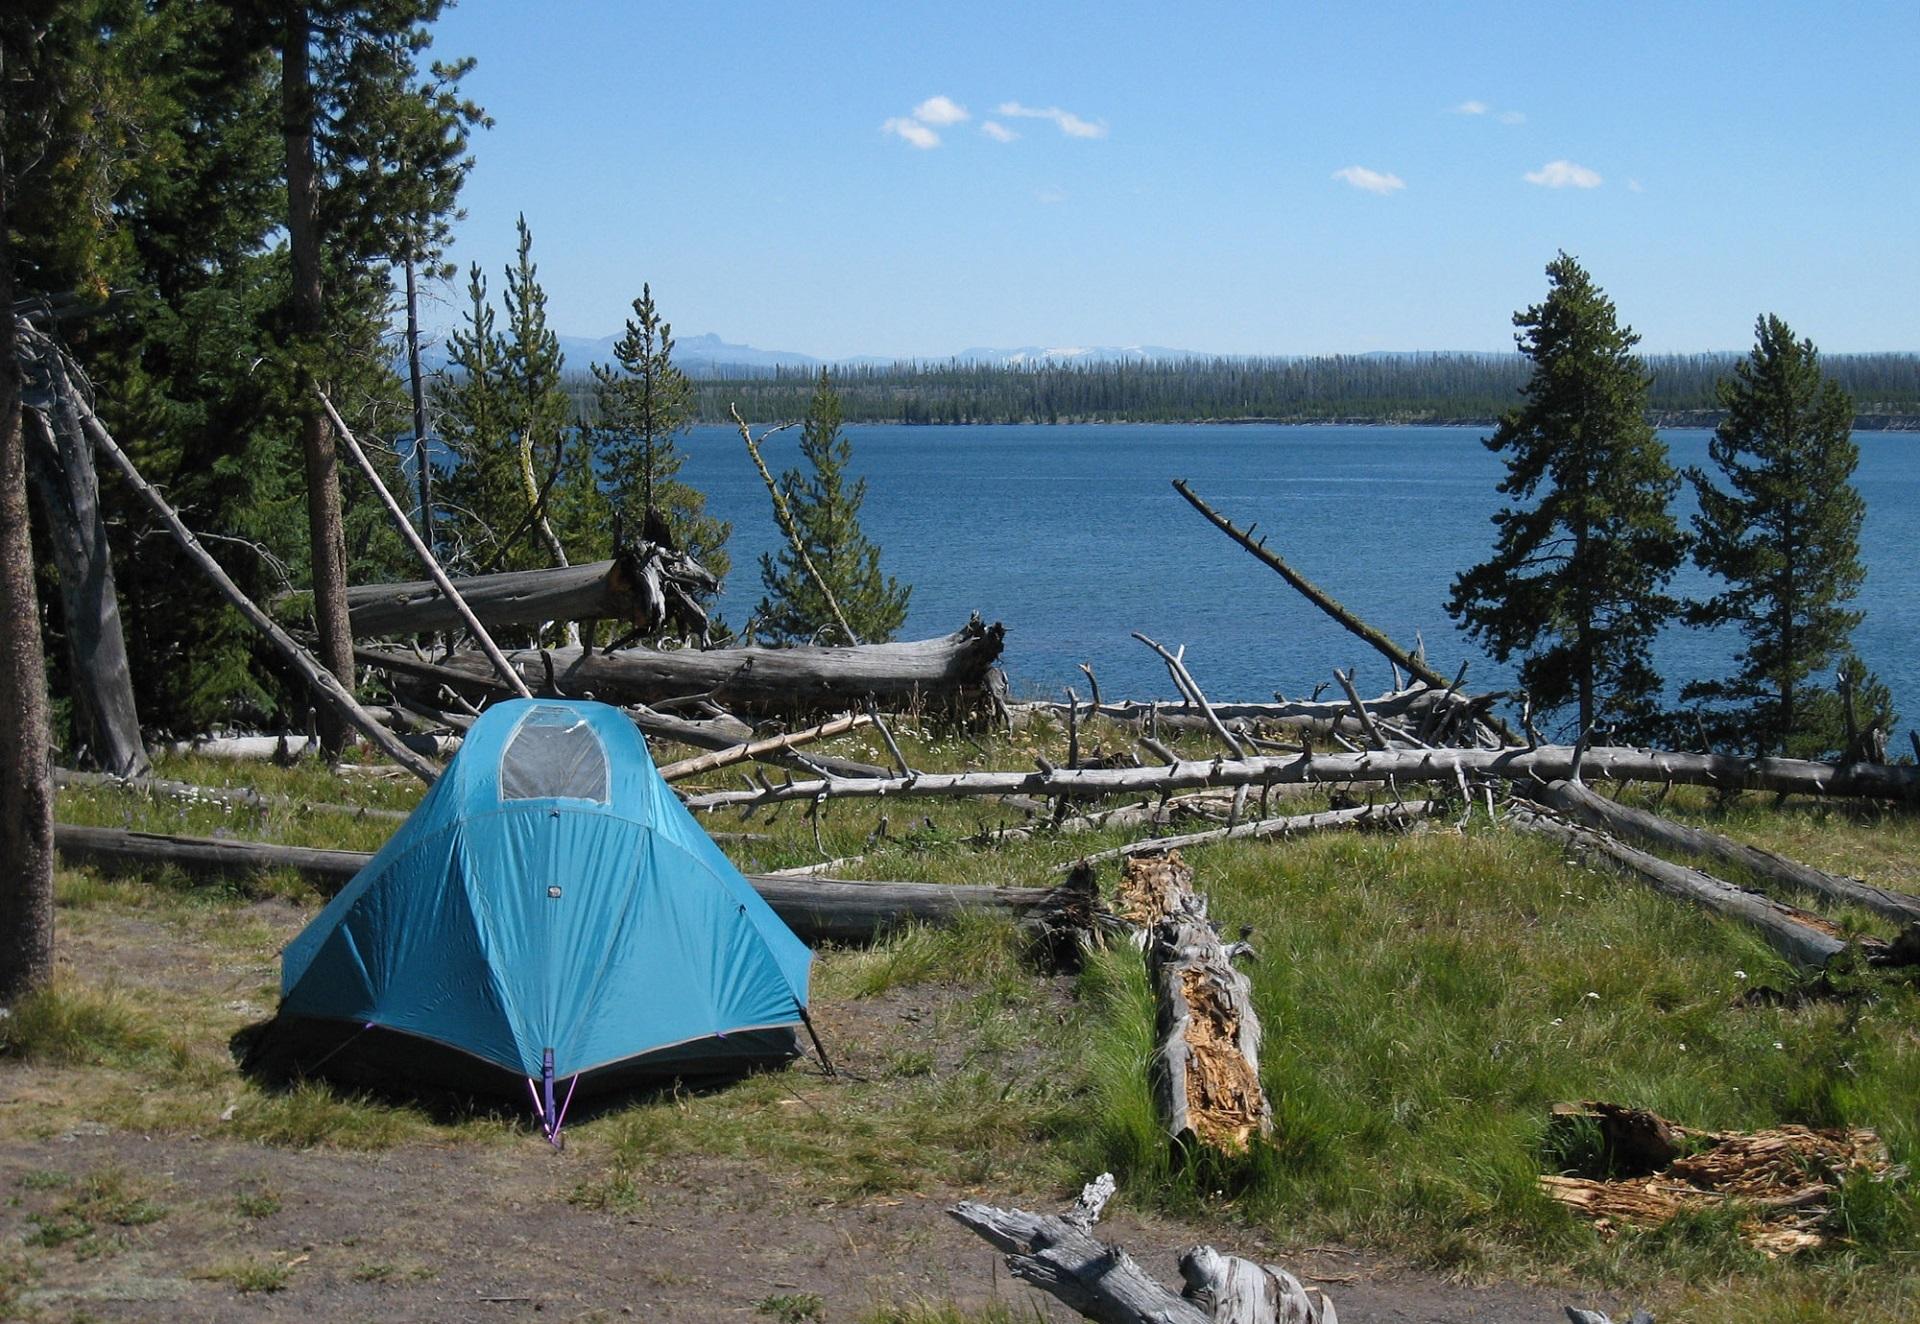 Free Images Landscape Nature Wilderness Adventure Equipment